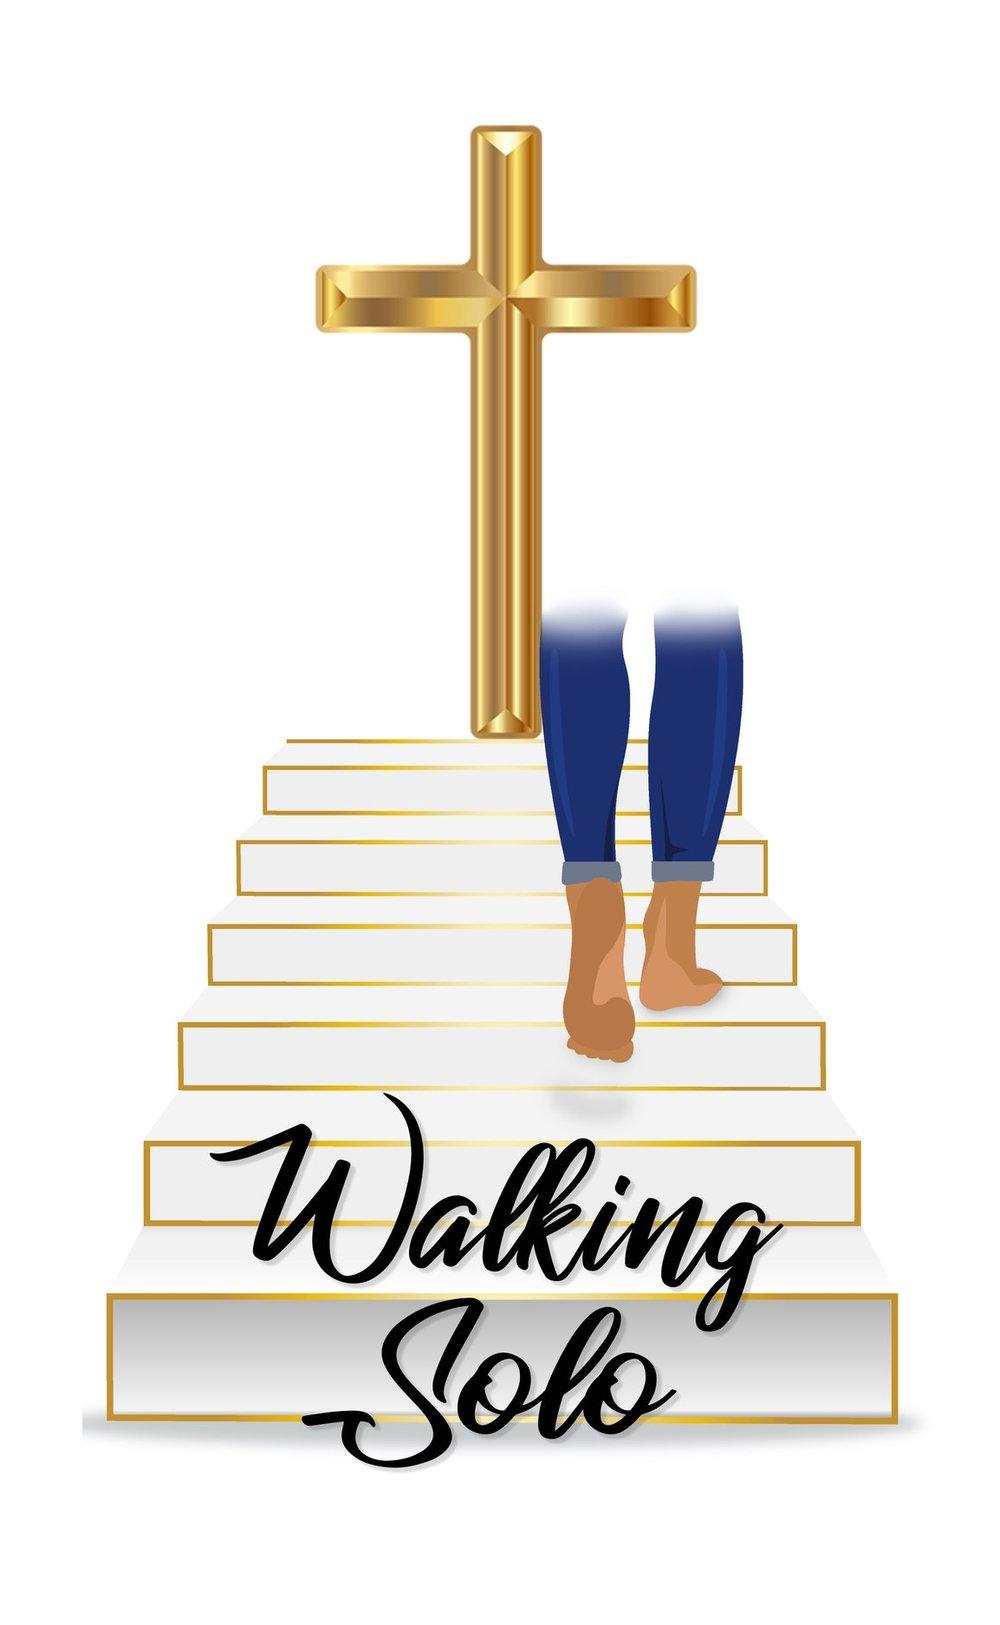 Walking Solo: The Blog - For the single, millennial Christian. (Joshua 1:9)